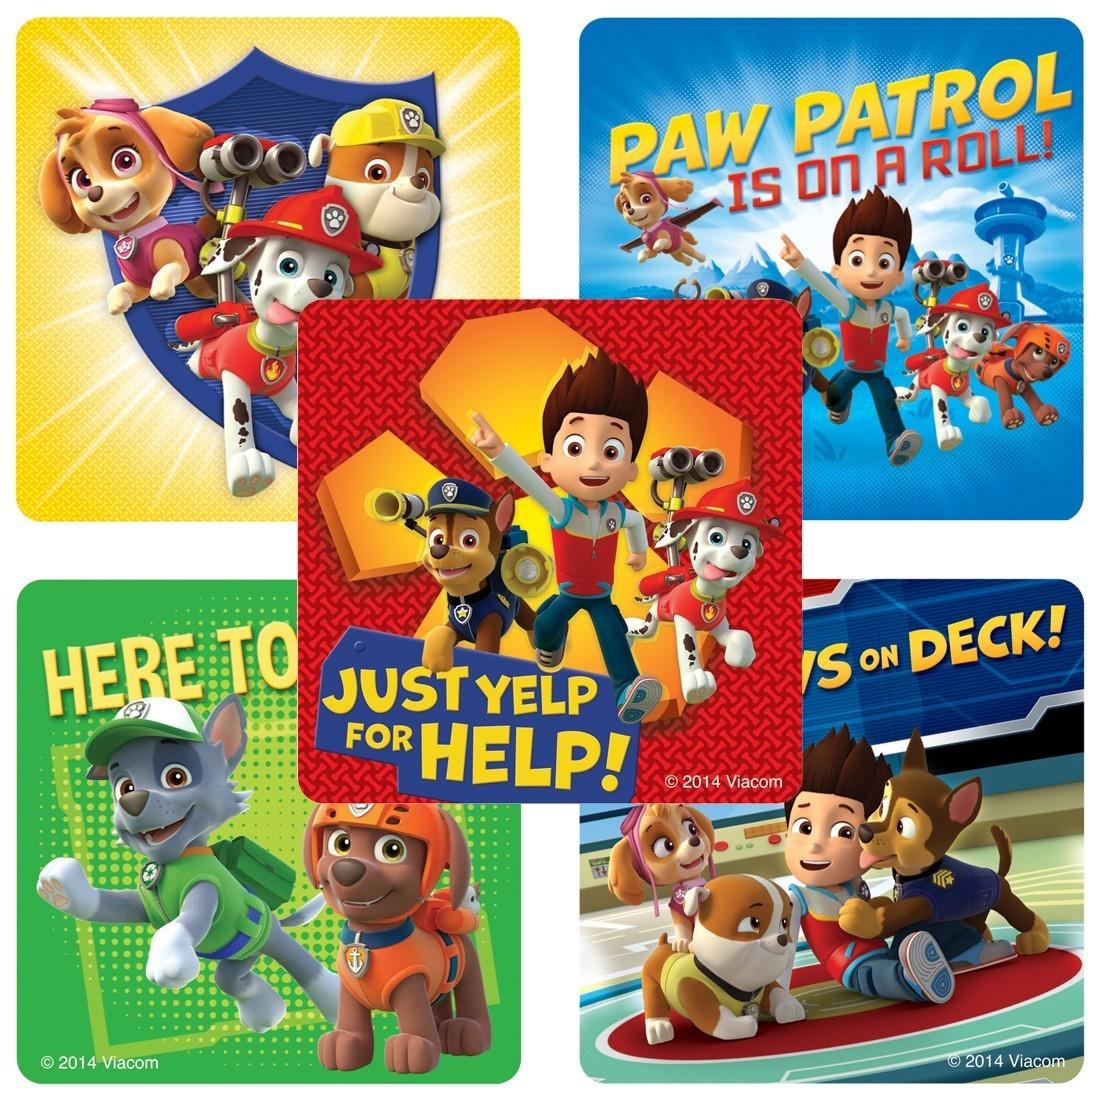 PAW Patrol Stickers                                [image]